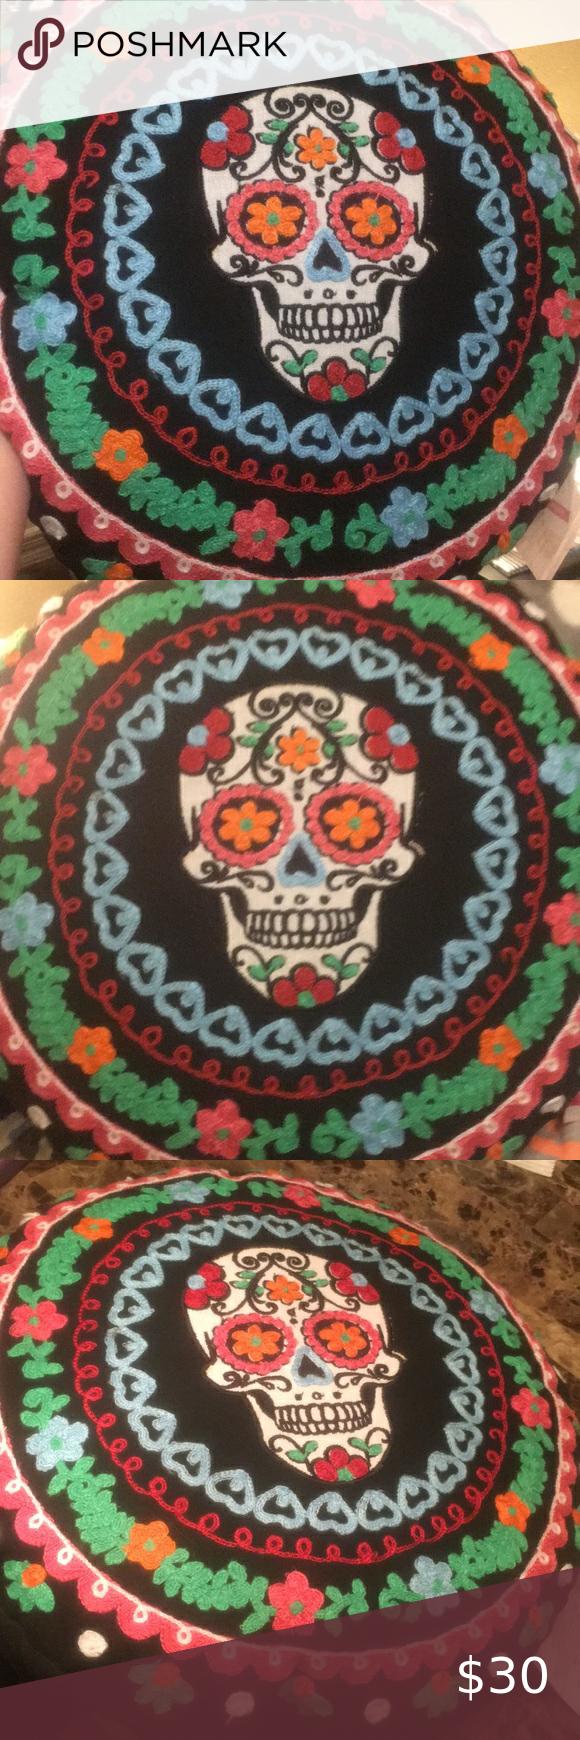 Sugar Skull decorative pillow  round boho hippie Sugar Skull embroidery pillow  ...